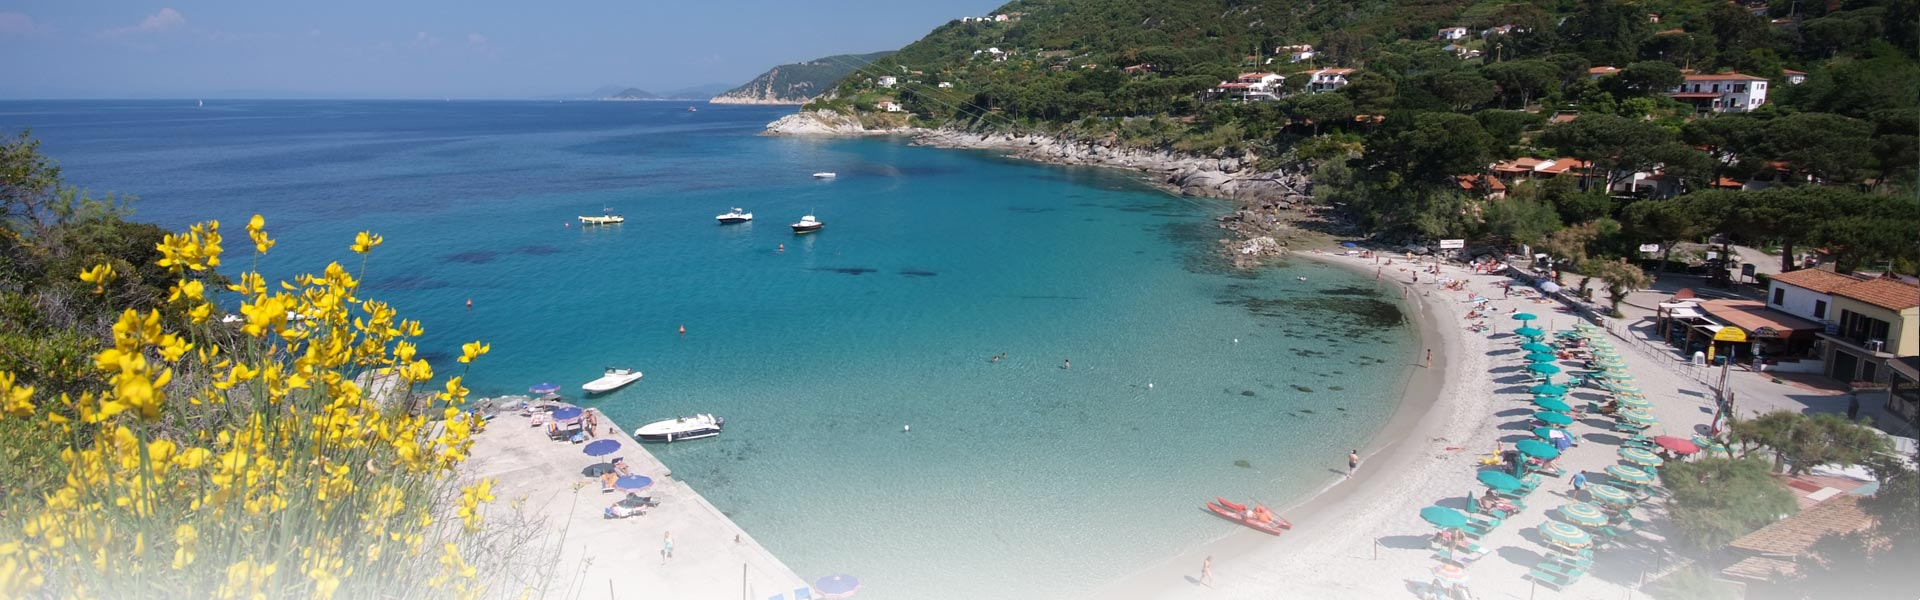 Hotel Elba: alberghi a Capo Sant\'Andrea | Hotel Barsalini, Isola d\'Elba